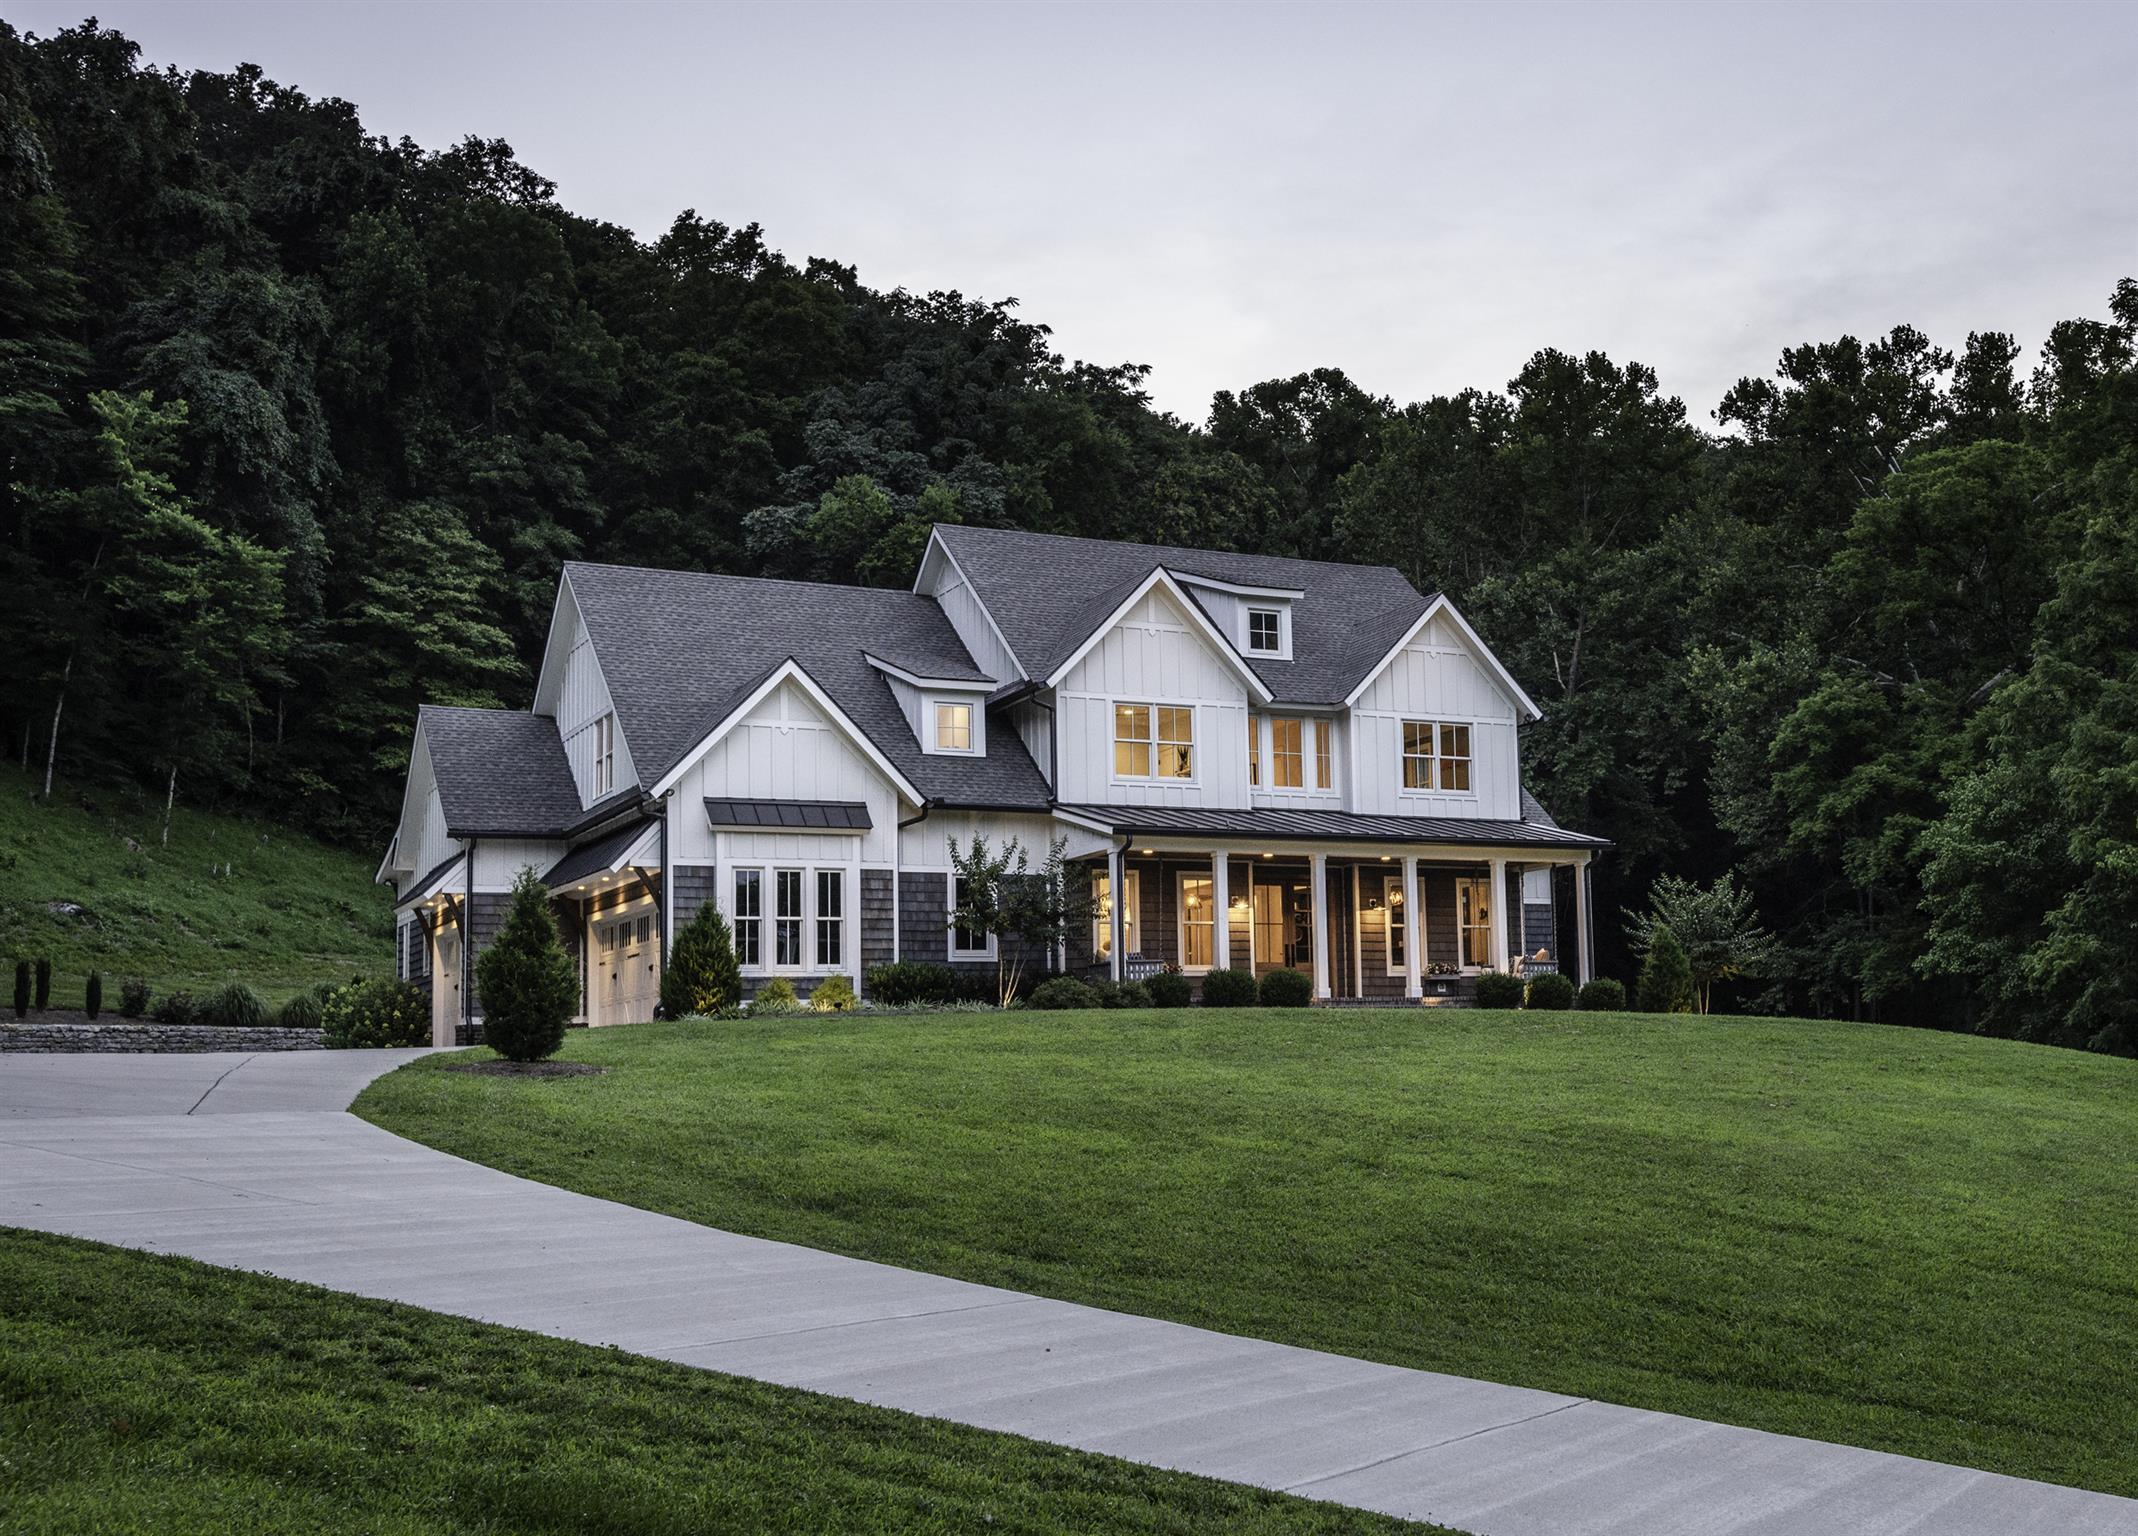 2050 Old Hillsboro Rd, Franklin, TN 37064 - Franklin, TN real estate listing